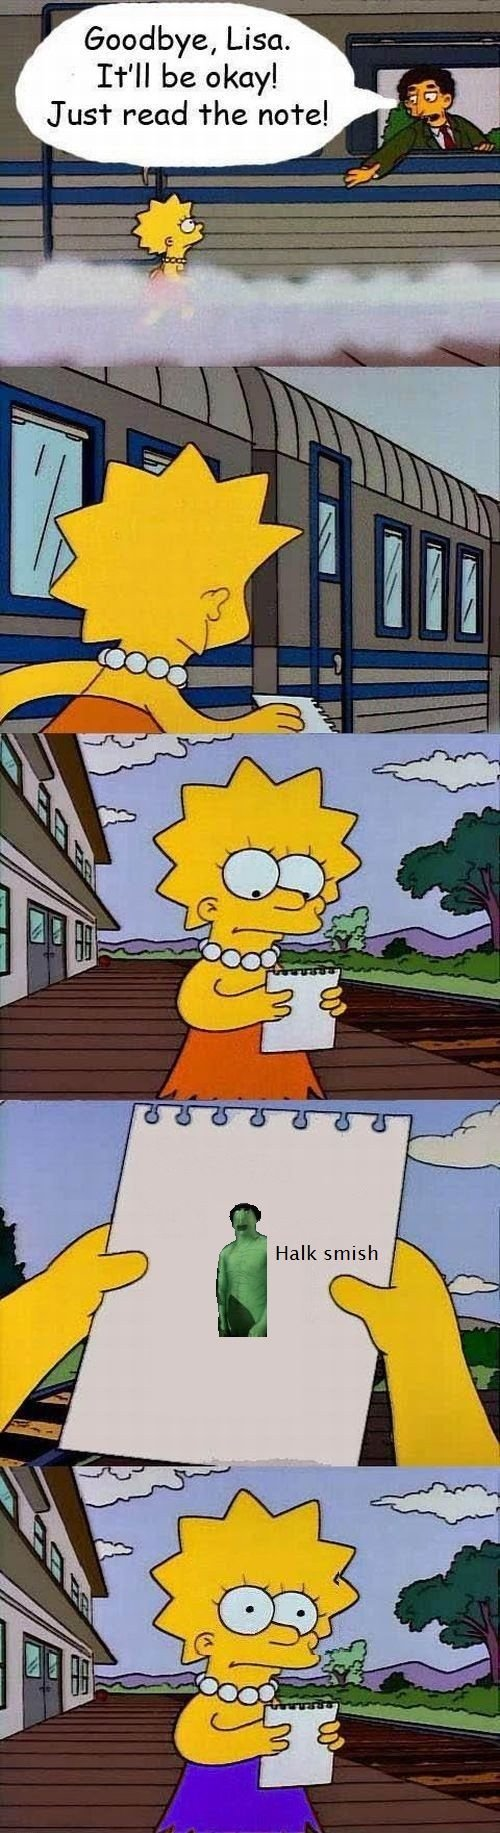 "Thur. . Goodbye, Lisa. It' ll be okay! Just read the note! sf"" Halk smish. Wololo"